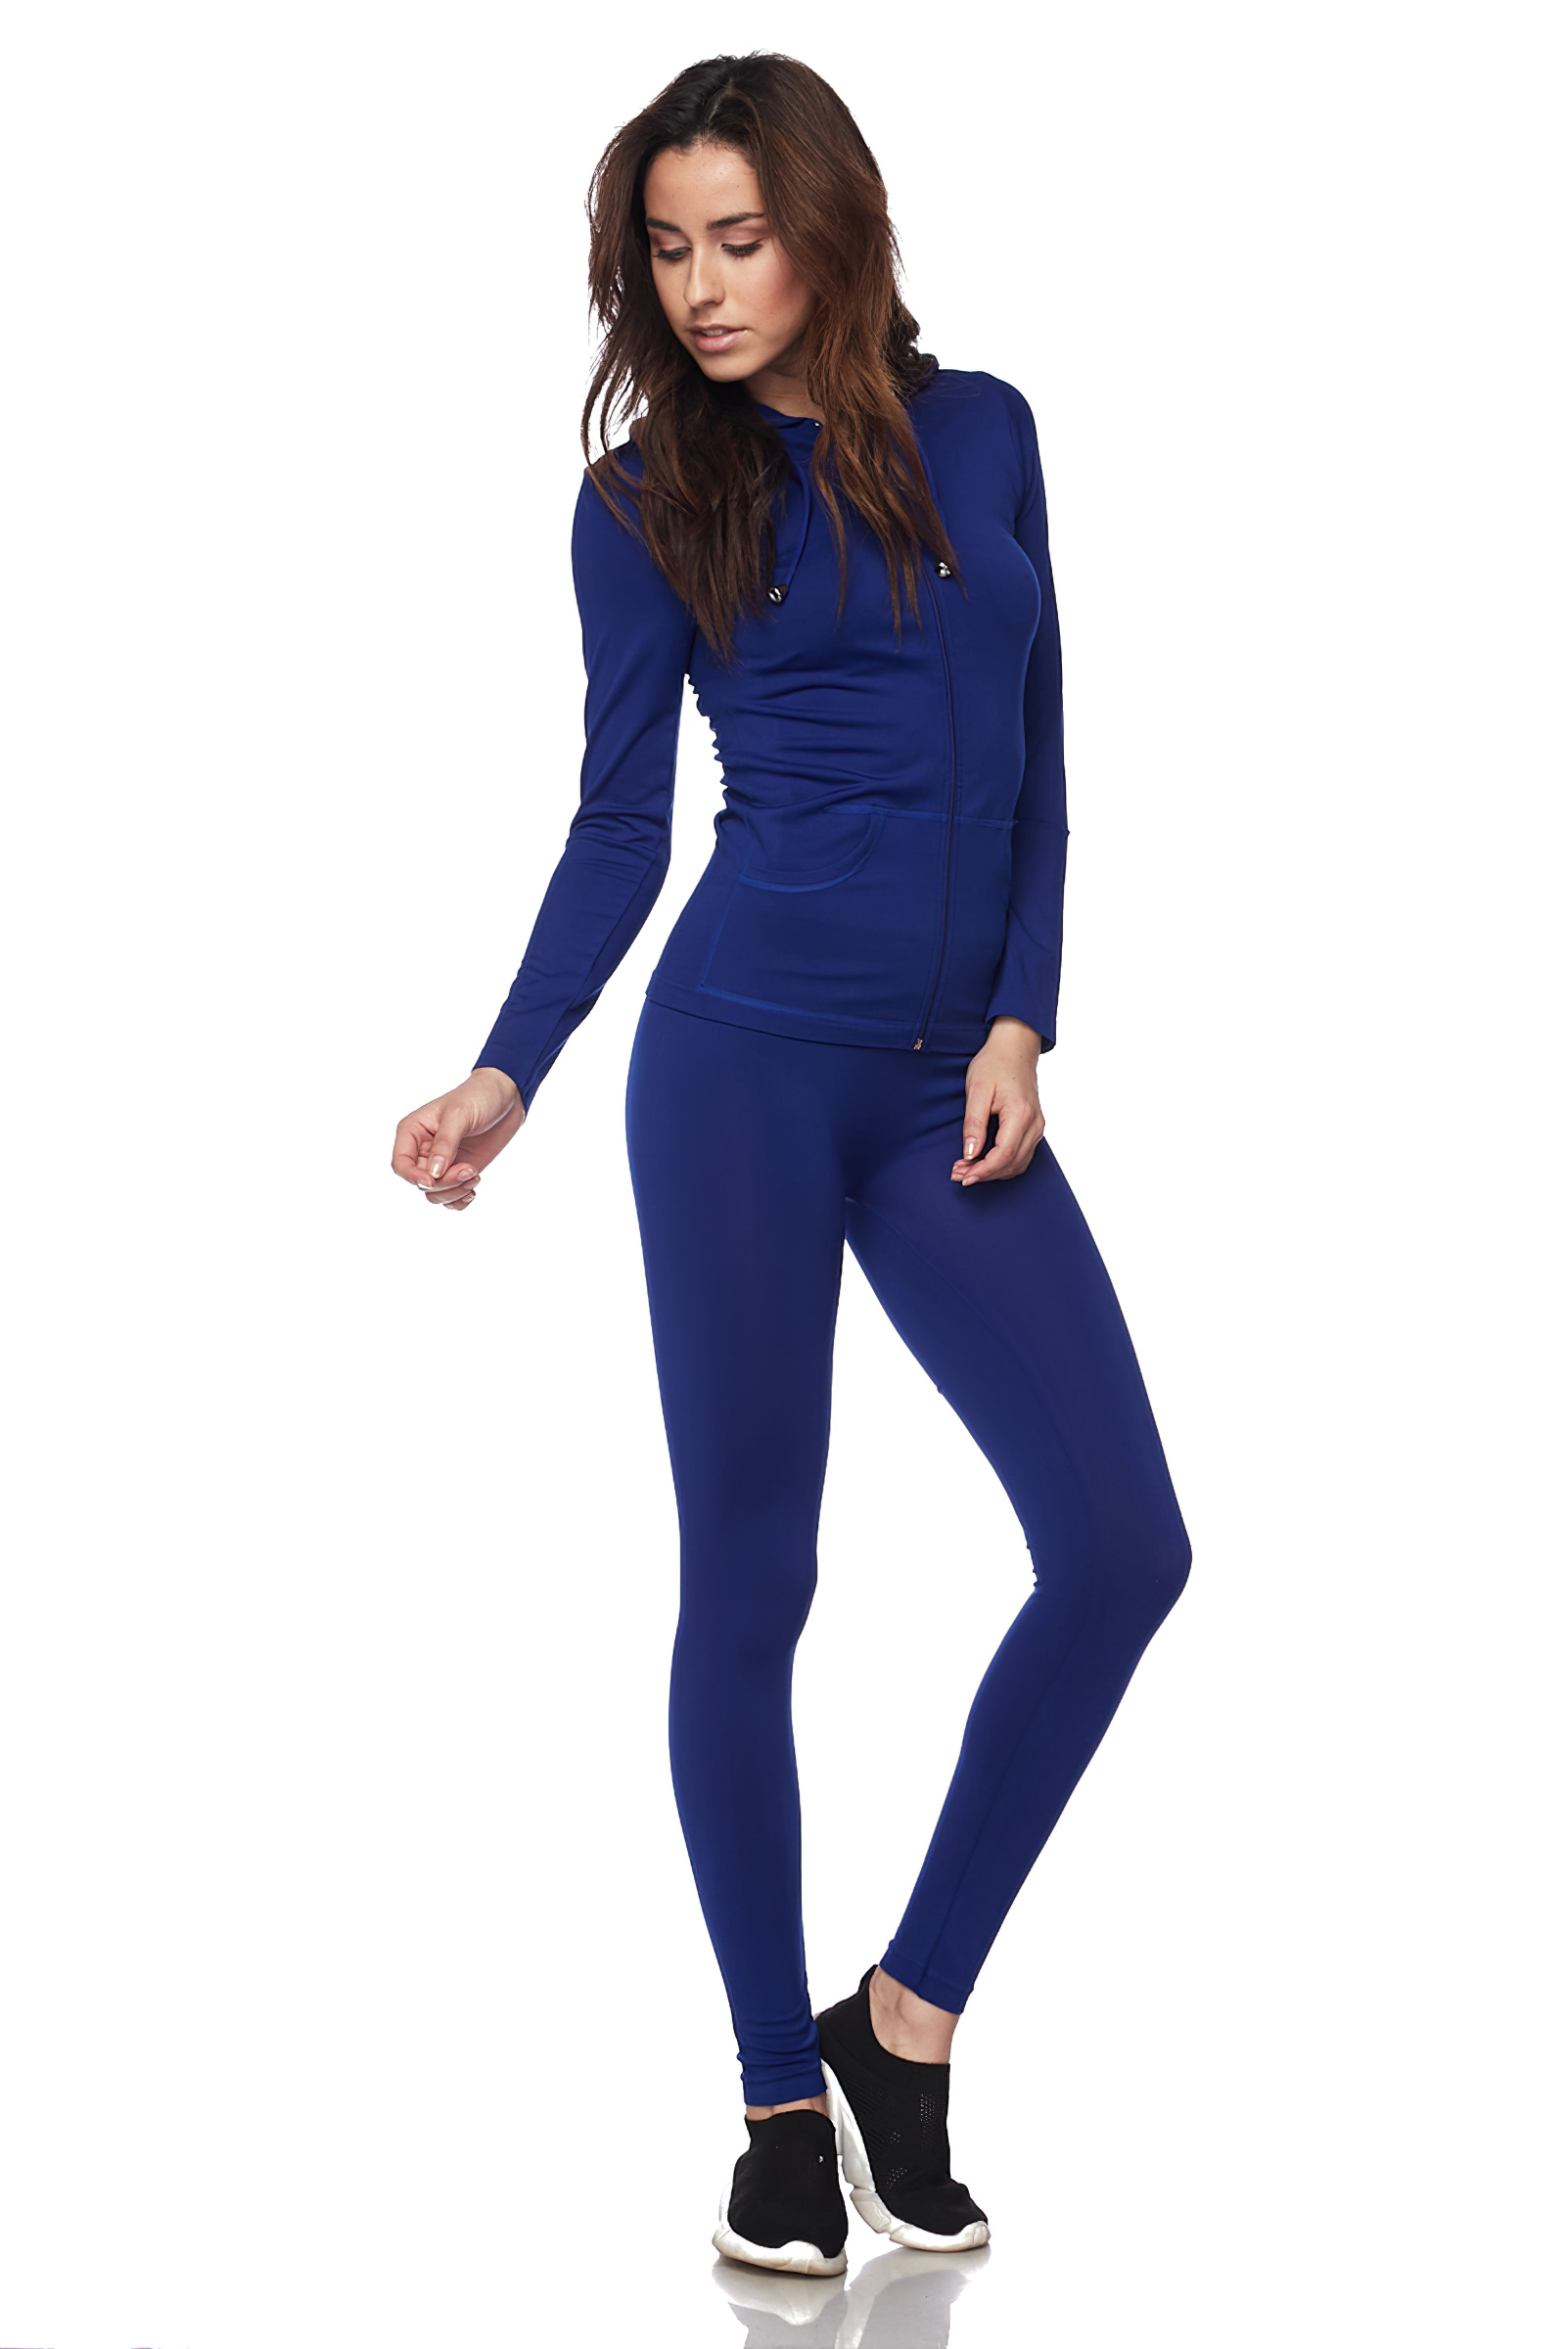 Women-039-s-Juniors-Active-Set-Wear-Zip-Up-Hoodie-and-Legging thumbnail 46